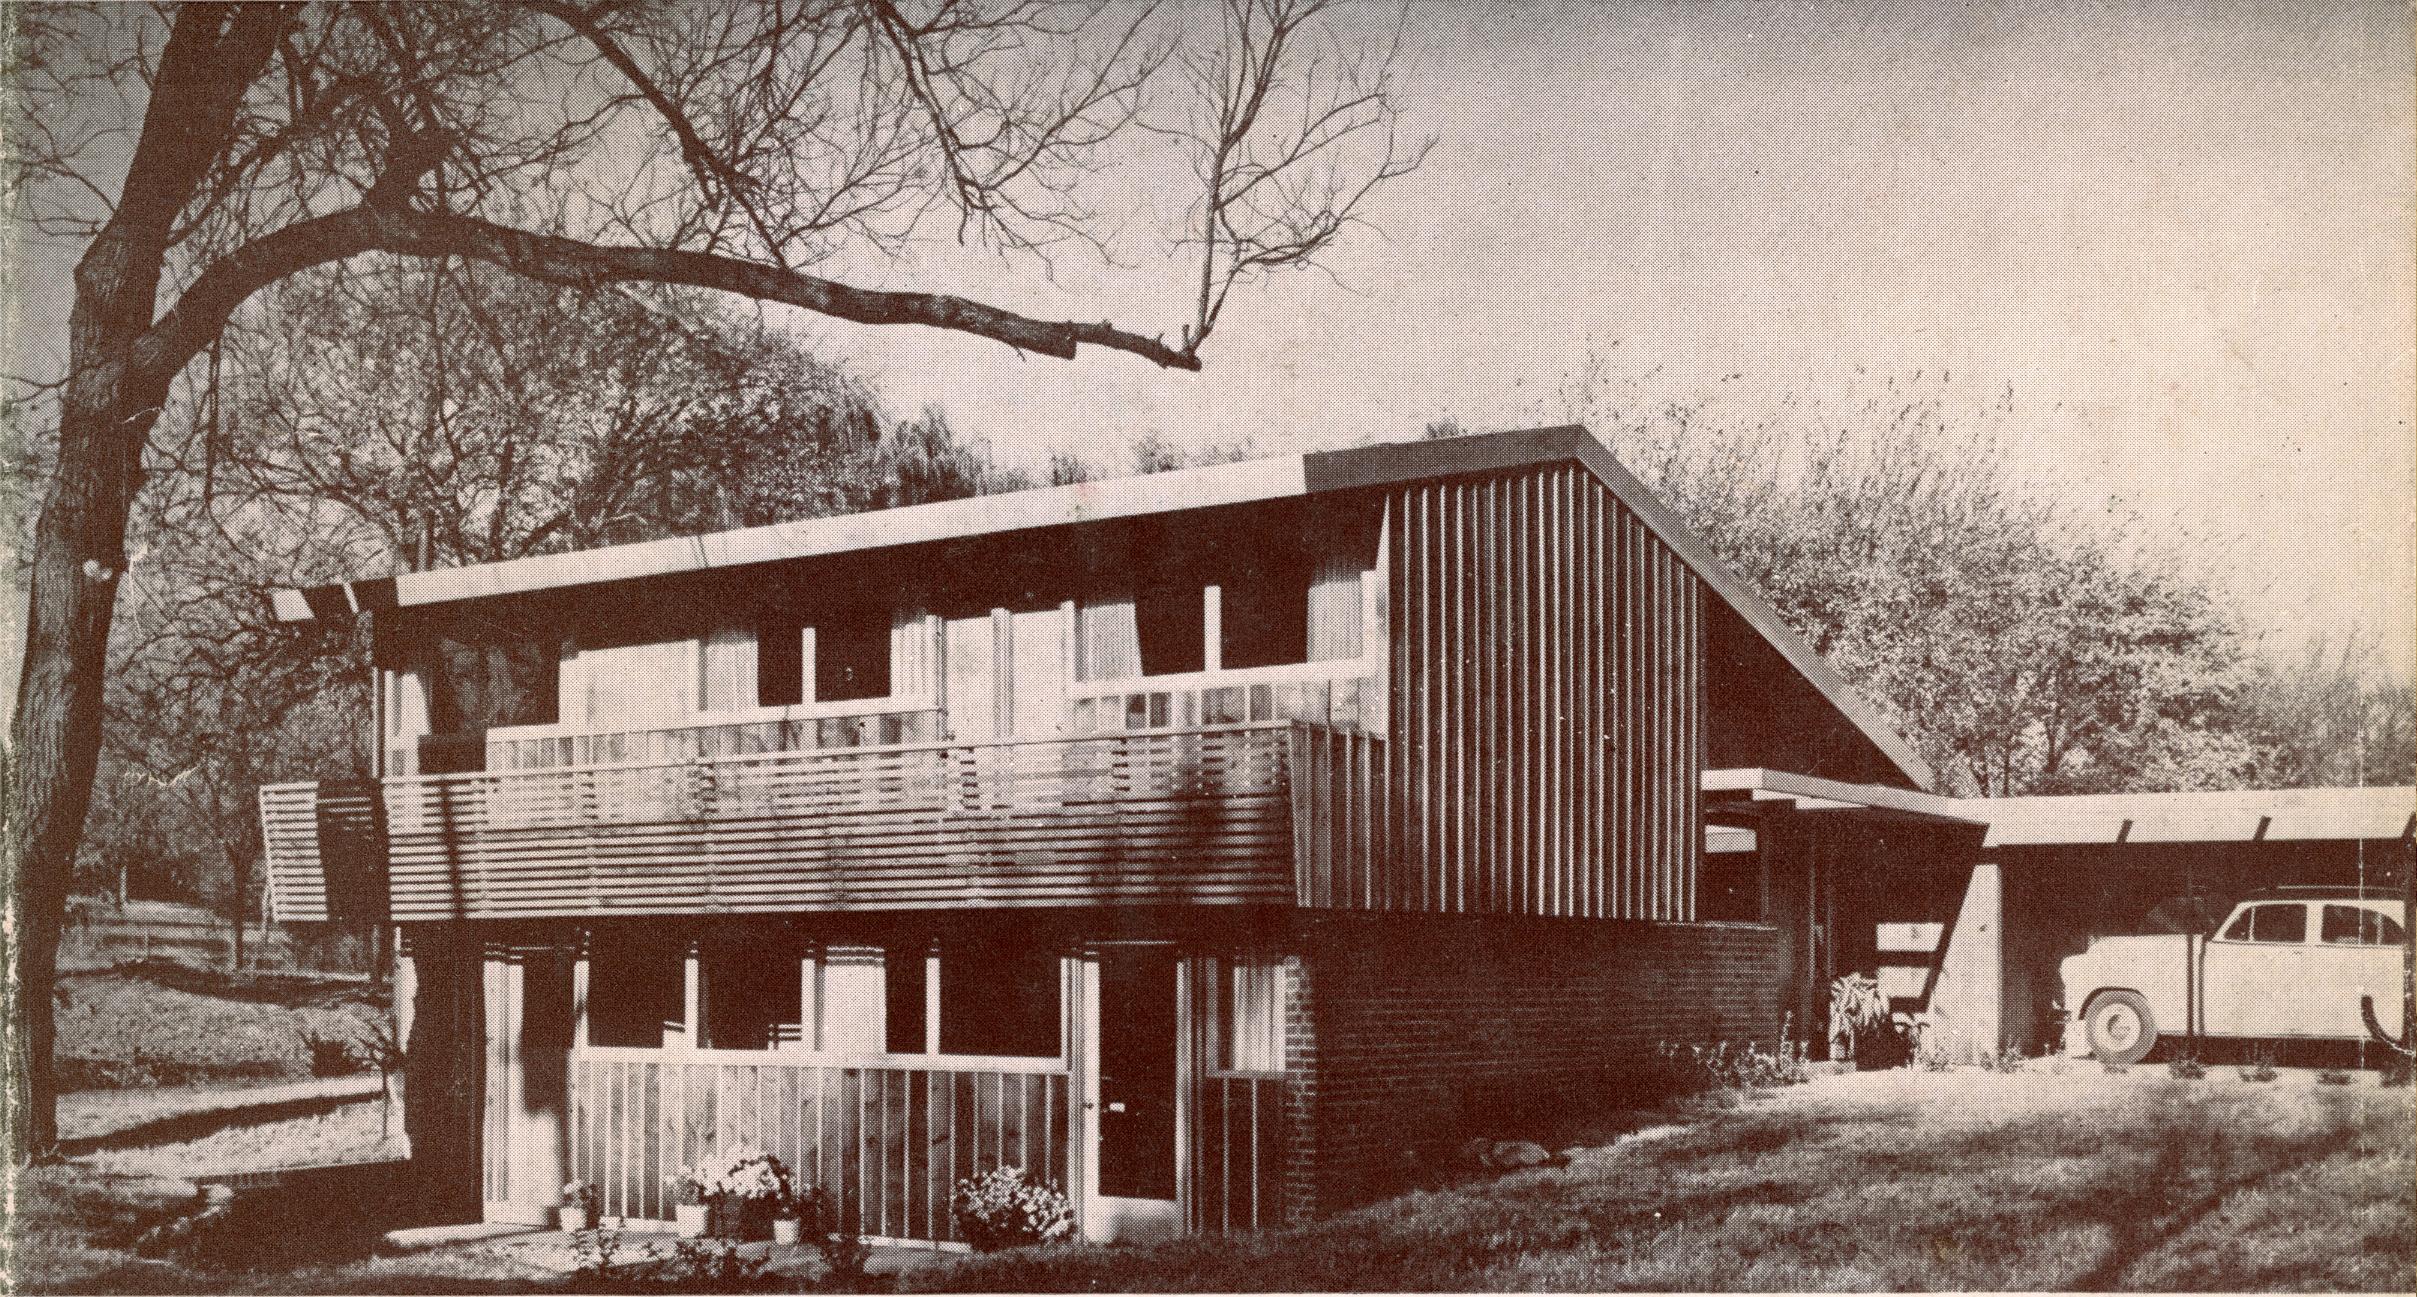 Revere Quality Home - Prairie Village Kansas - Architect David B. Runnells